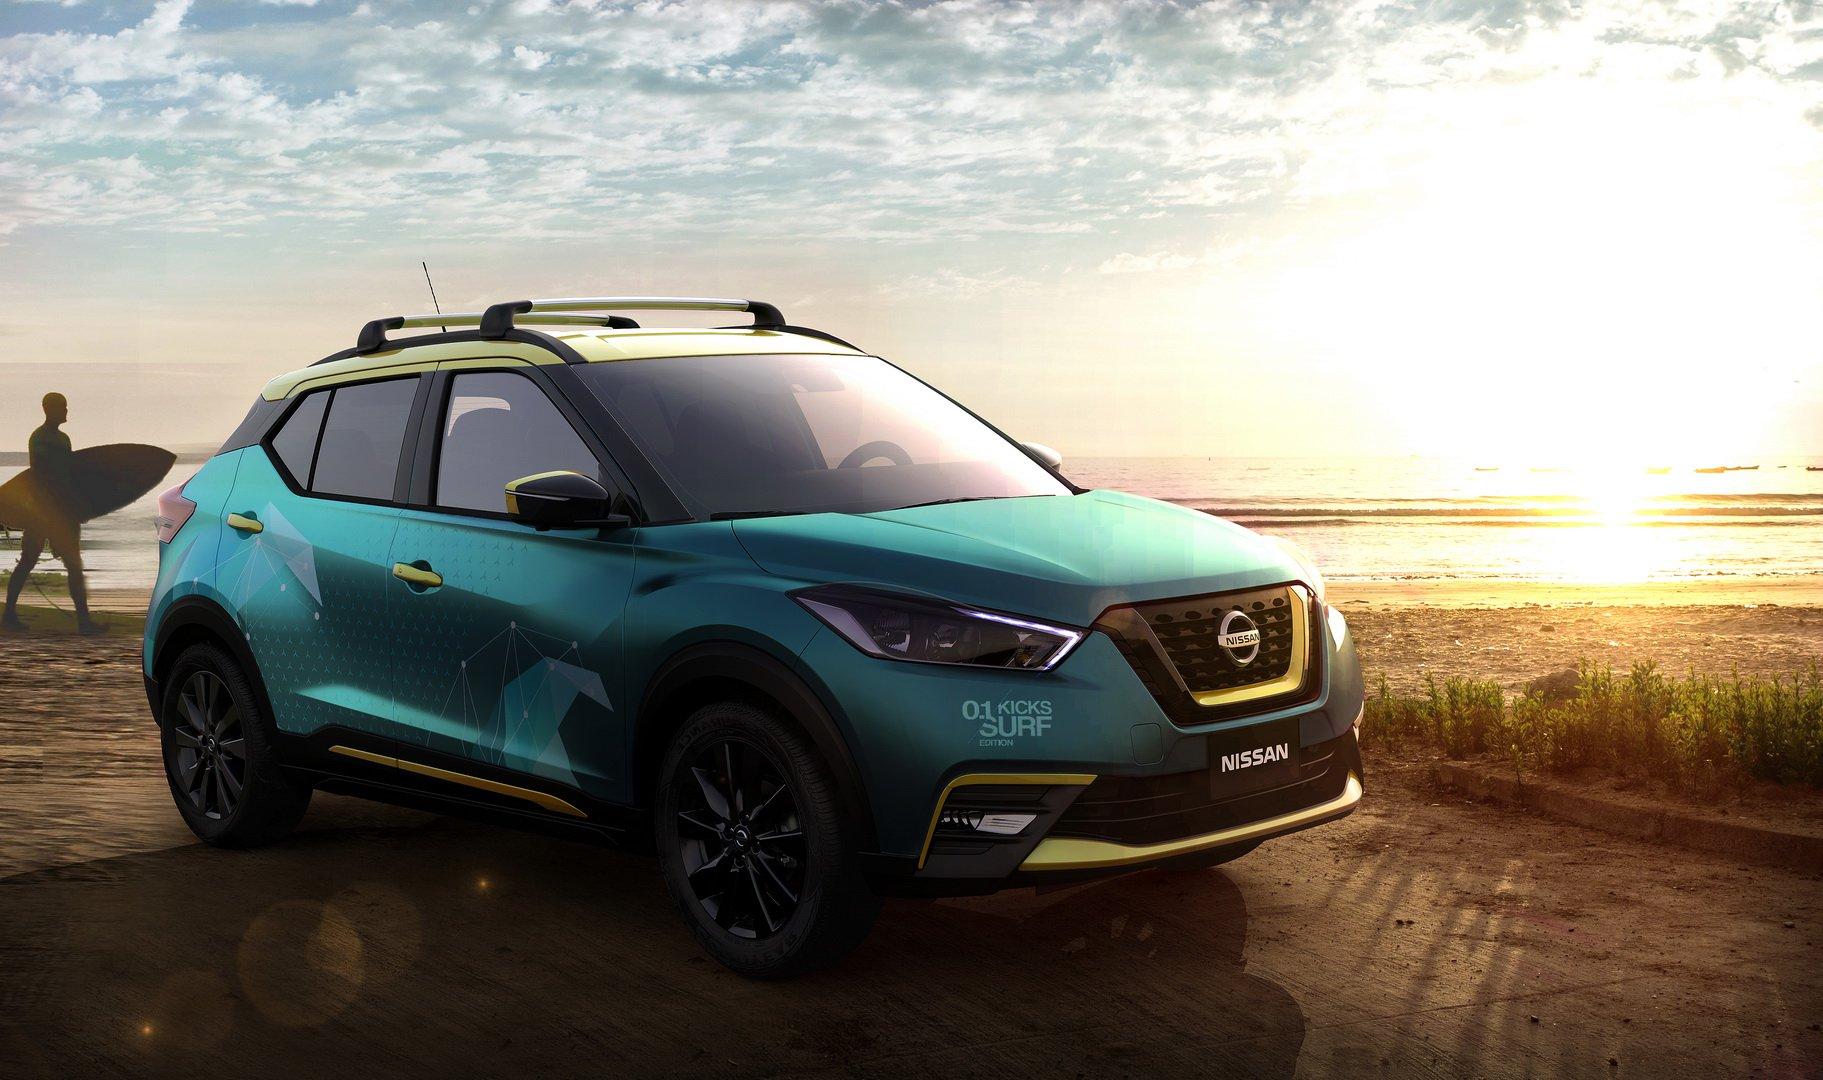 Nissan Kicks Surf Concept (1)